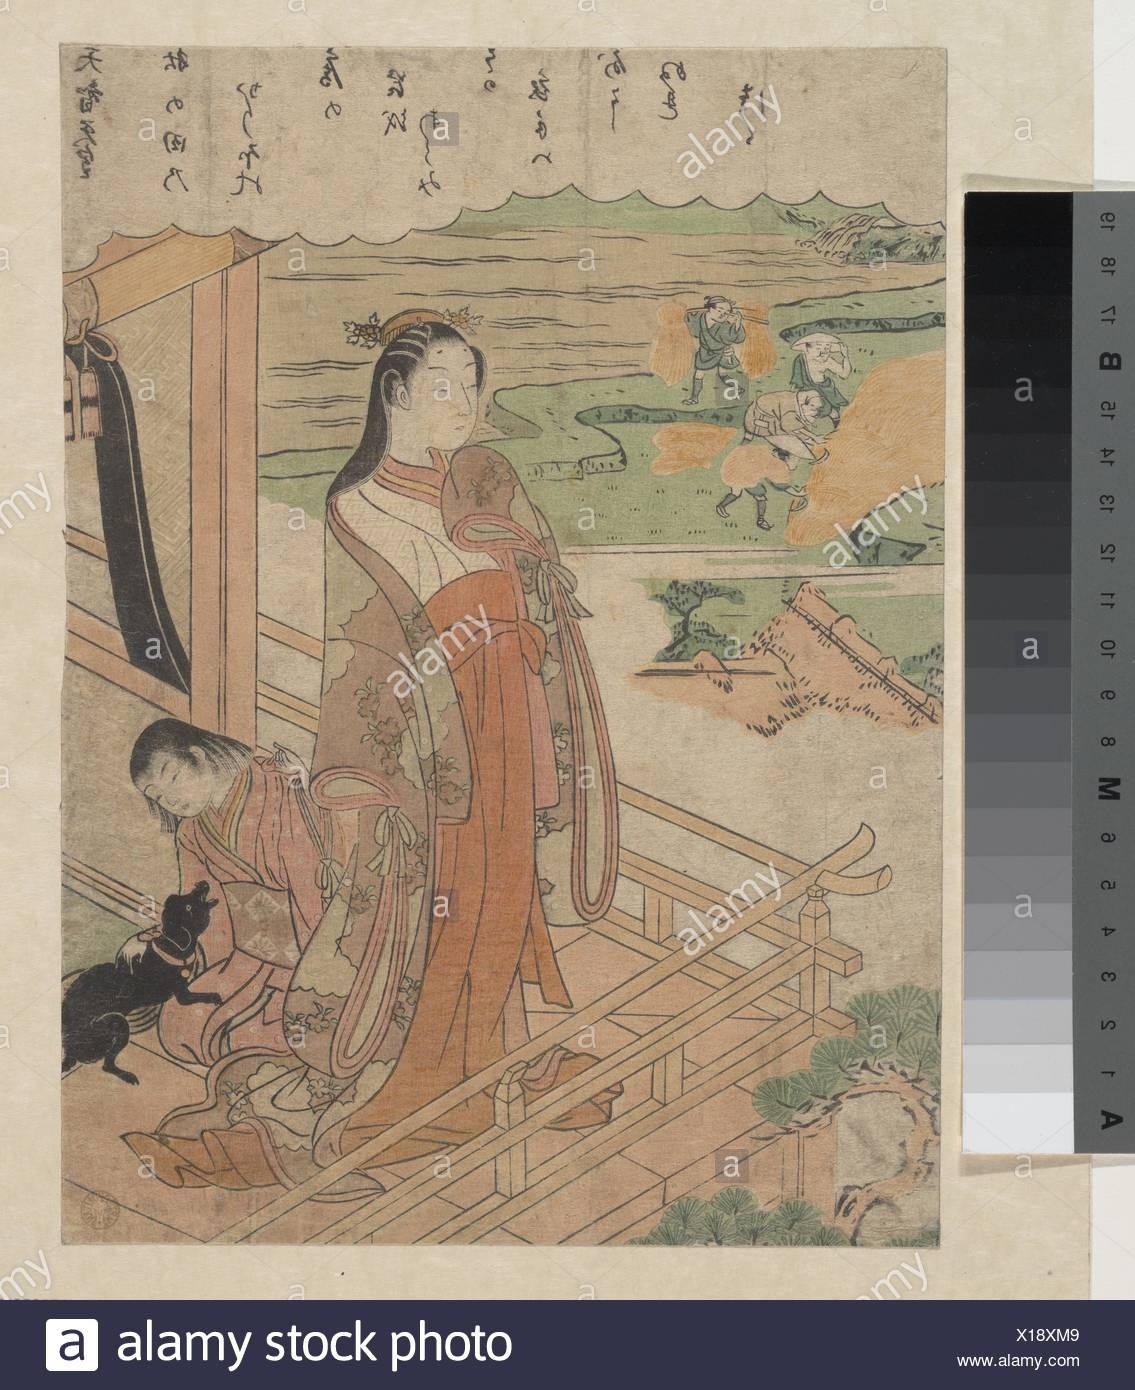 百人一é¦- 天智天皇/Sympathy. Artist: Suzuki Harunobu (Japanese, 1725-1770); Period: Edo period (1615-1868); Date: ca. 1768; Culture: Japan; - Stock Image